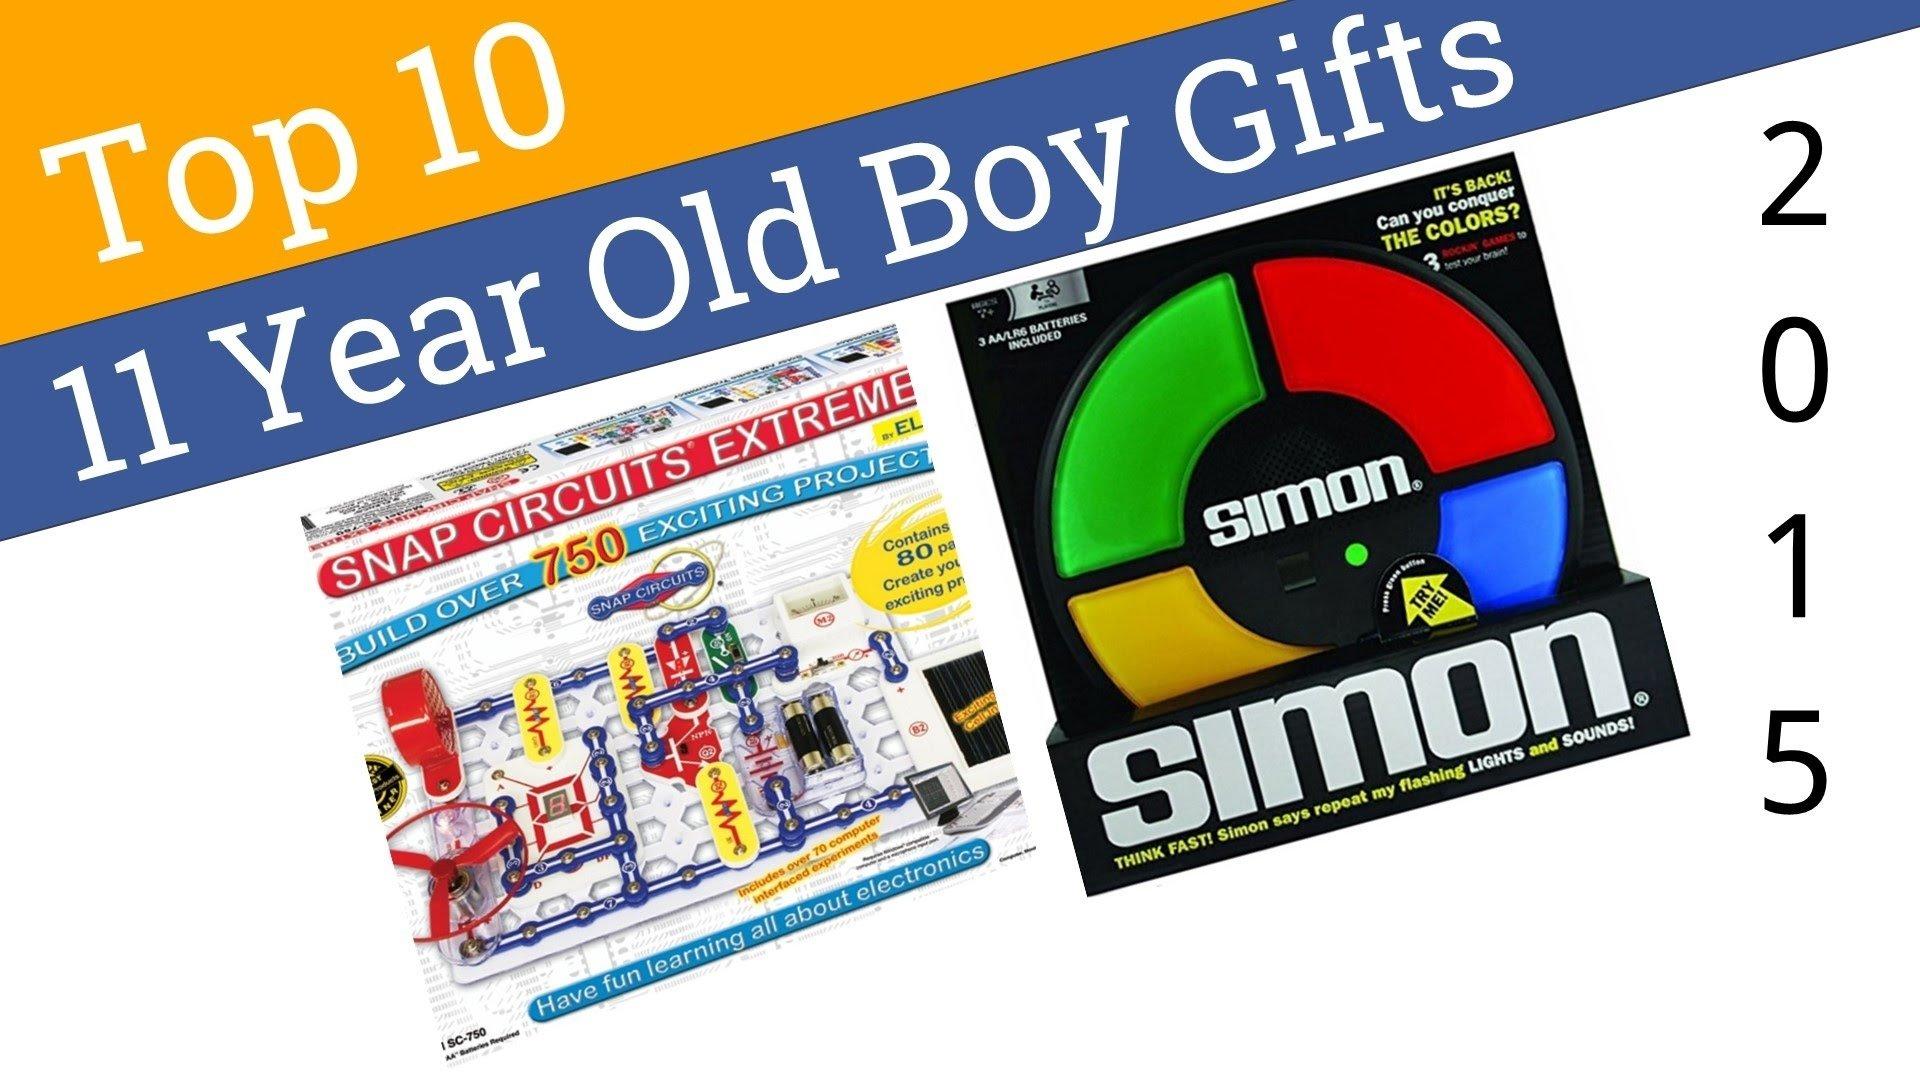 Cool Gifts For 7 Year Old Boy 2015 -|- nemetas.aufgegabelt.info